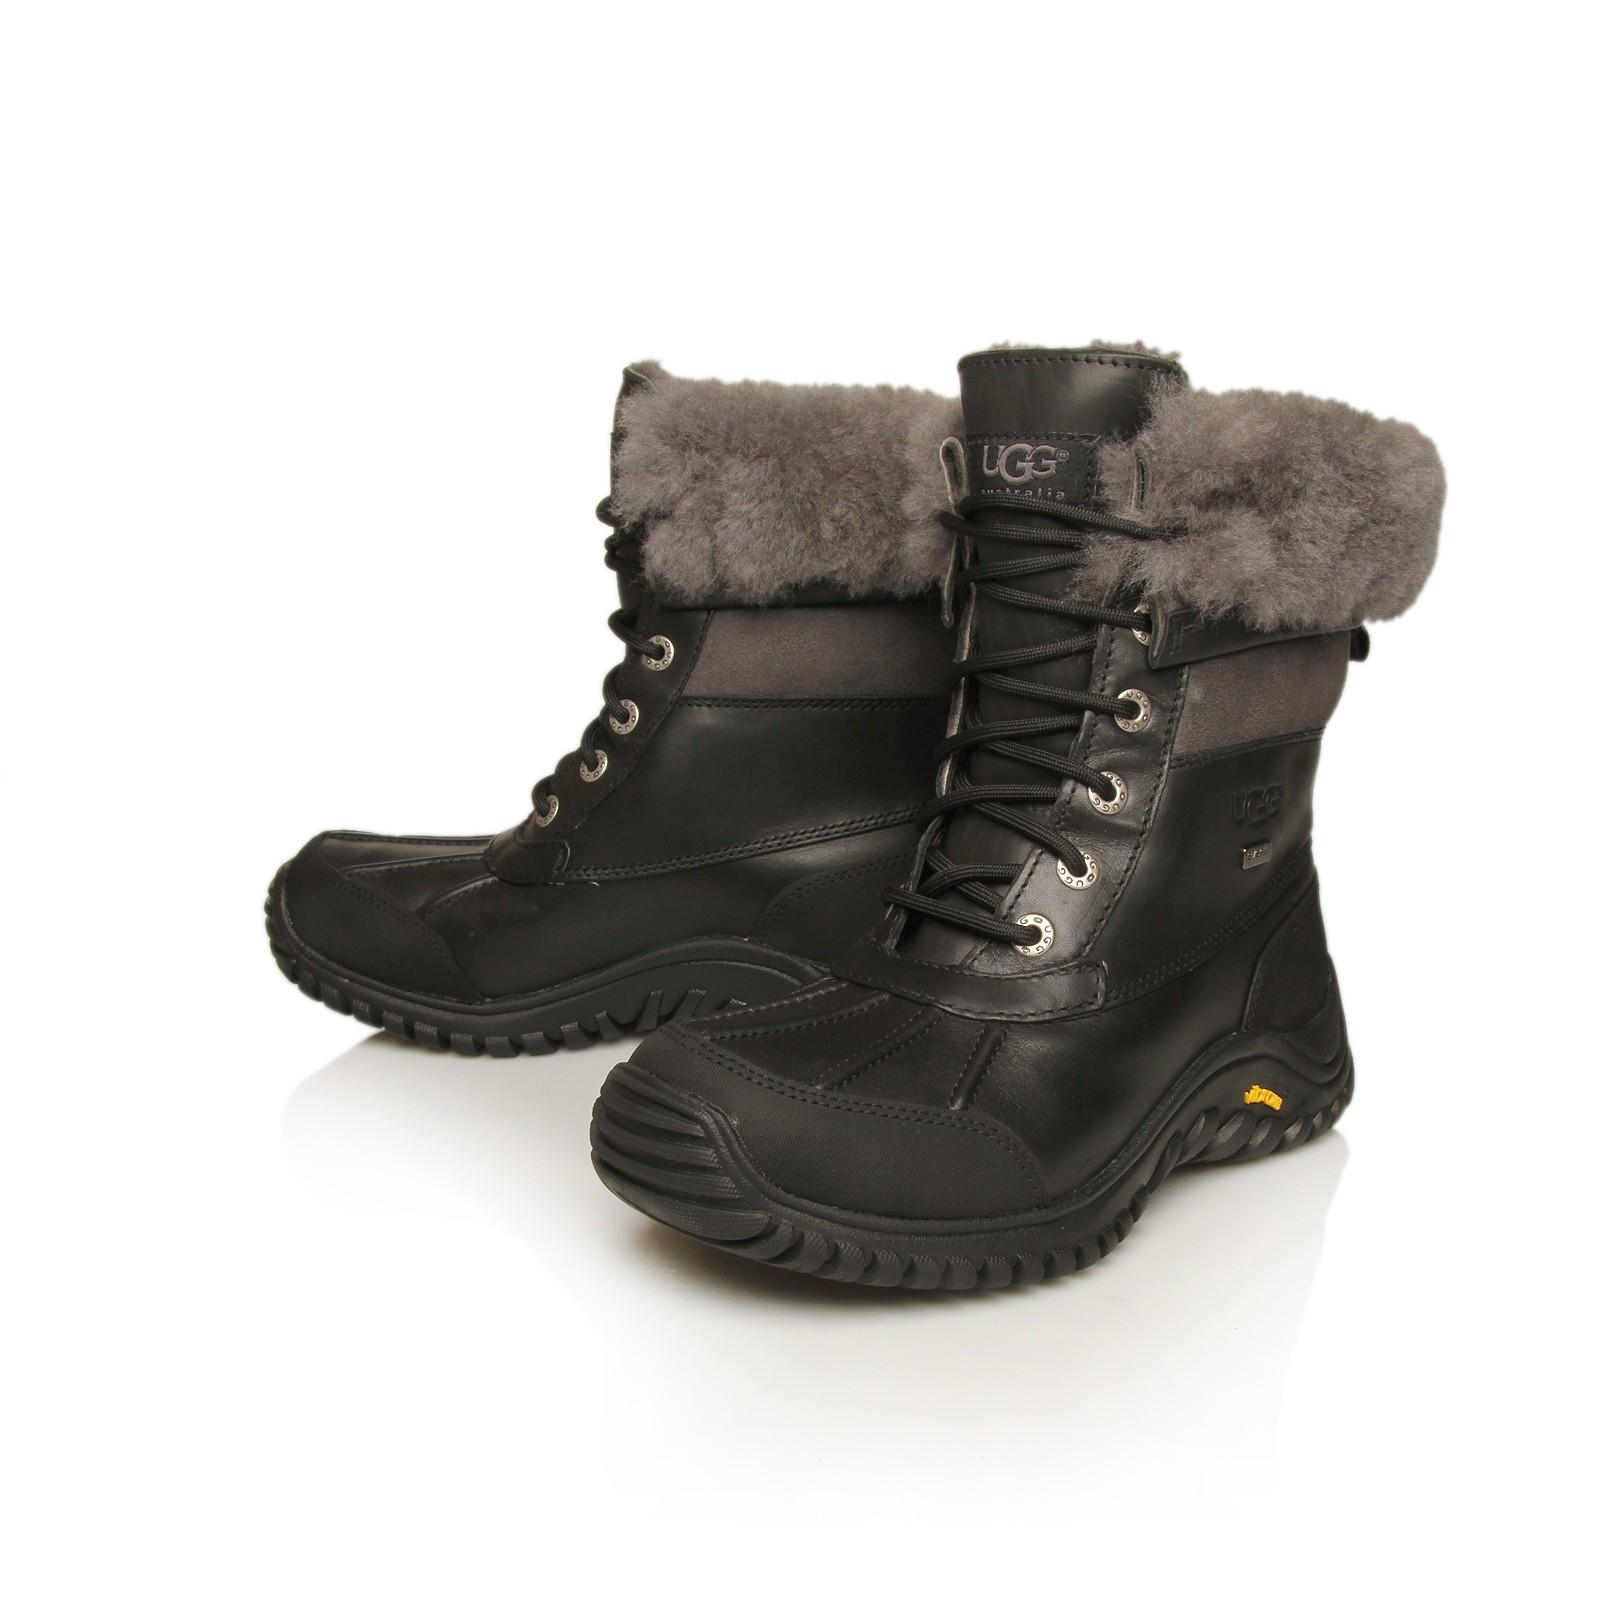 Ugg Adirondack Leather Boot Ii In Black Lyst